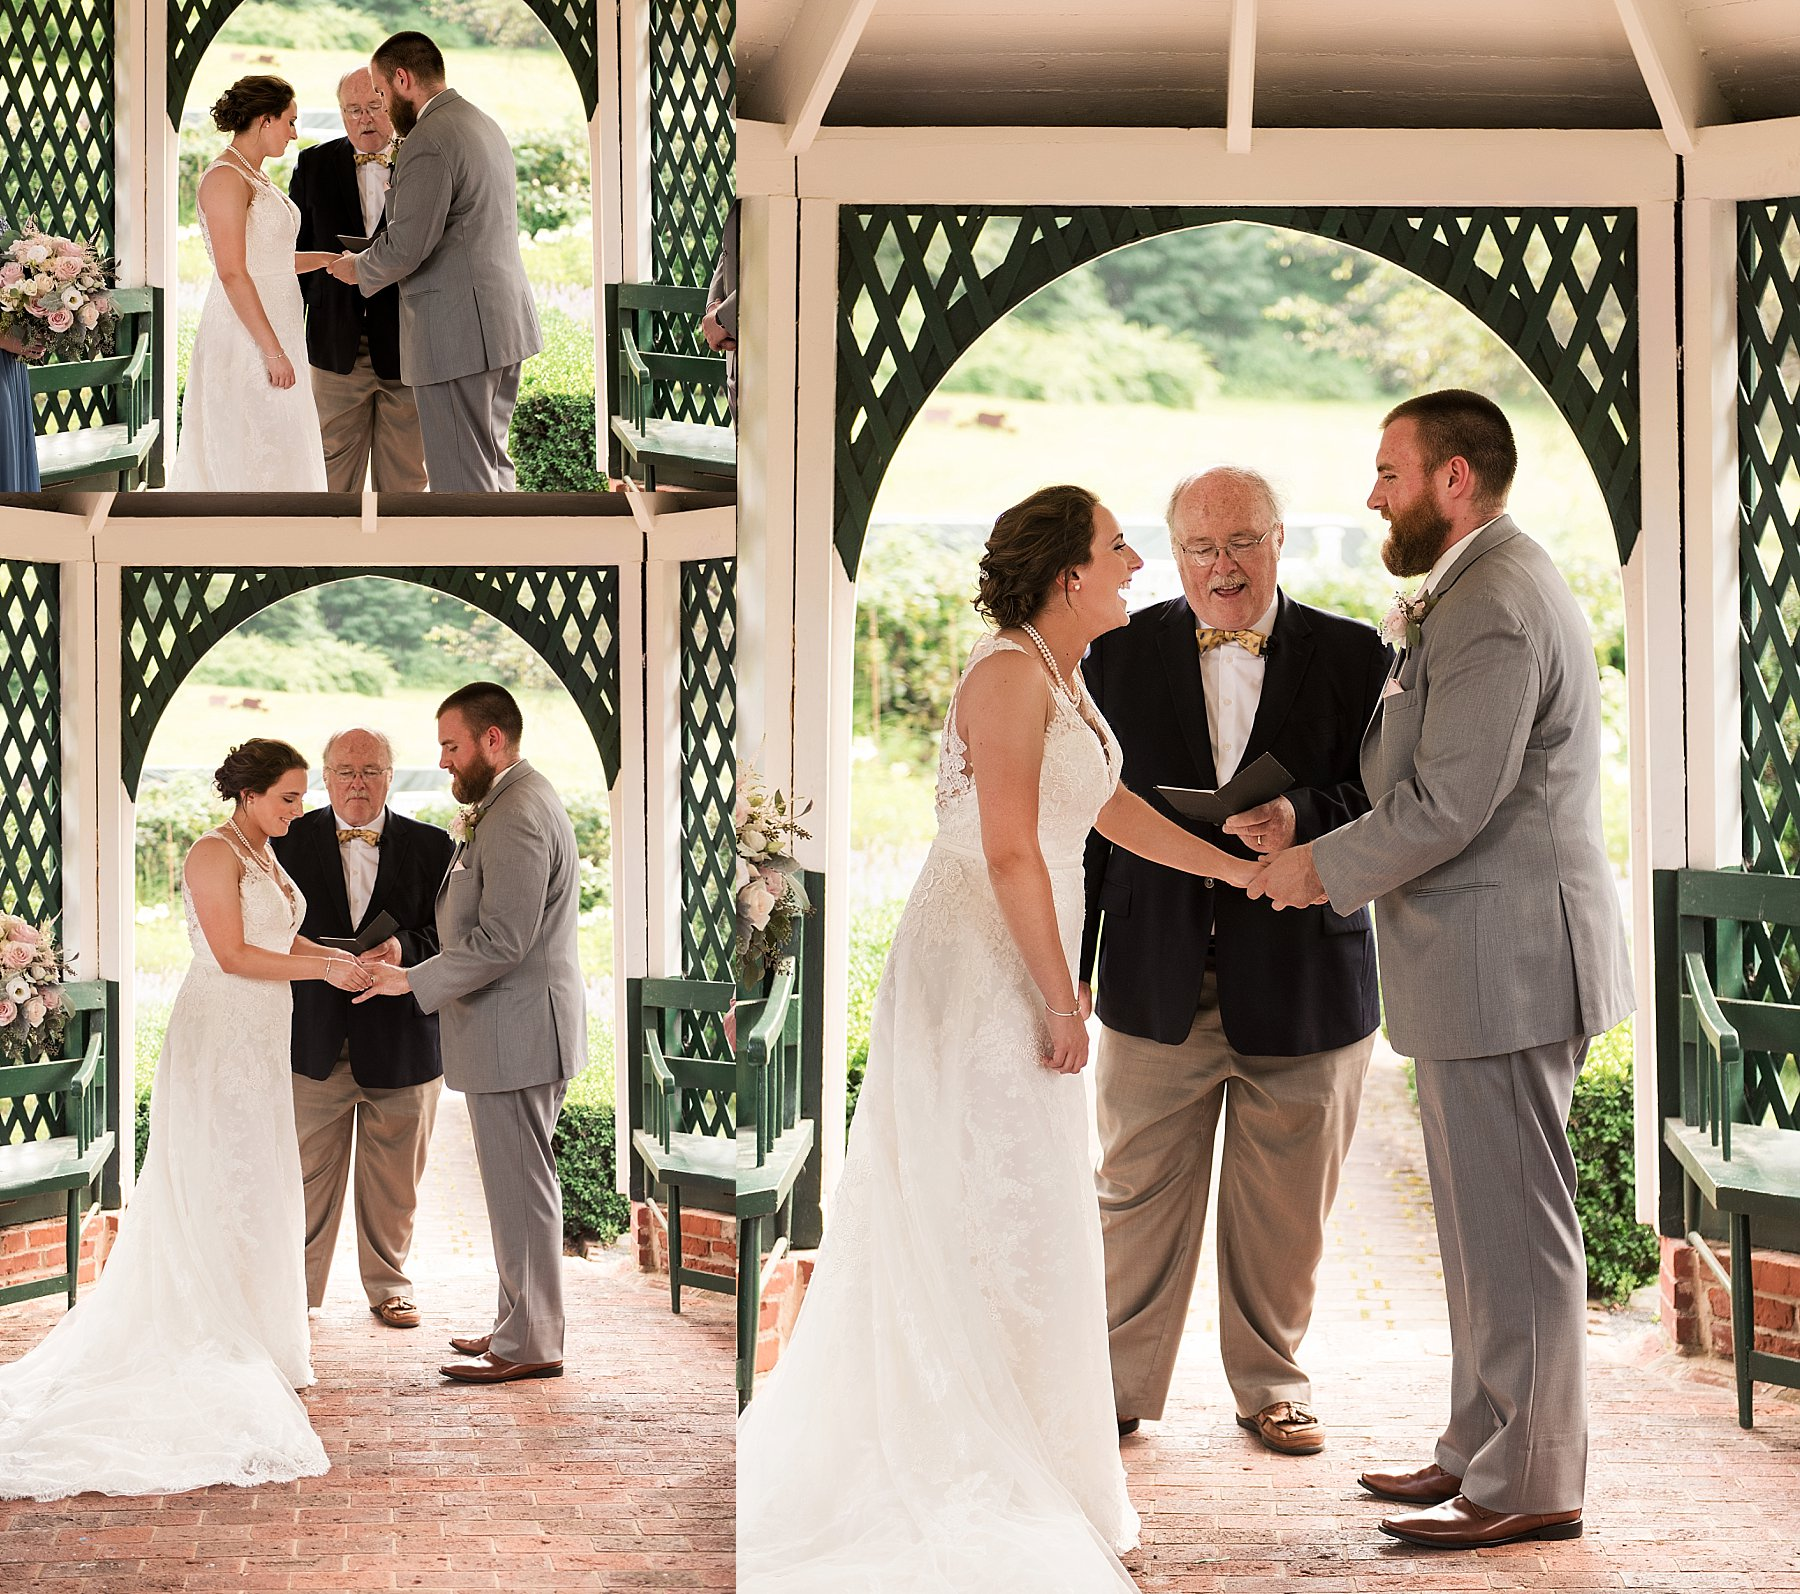 Bride and Groom during wedding ceremony in Farmington, CT